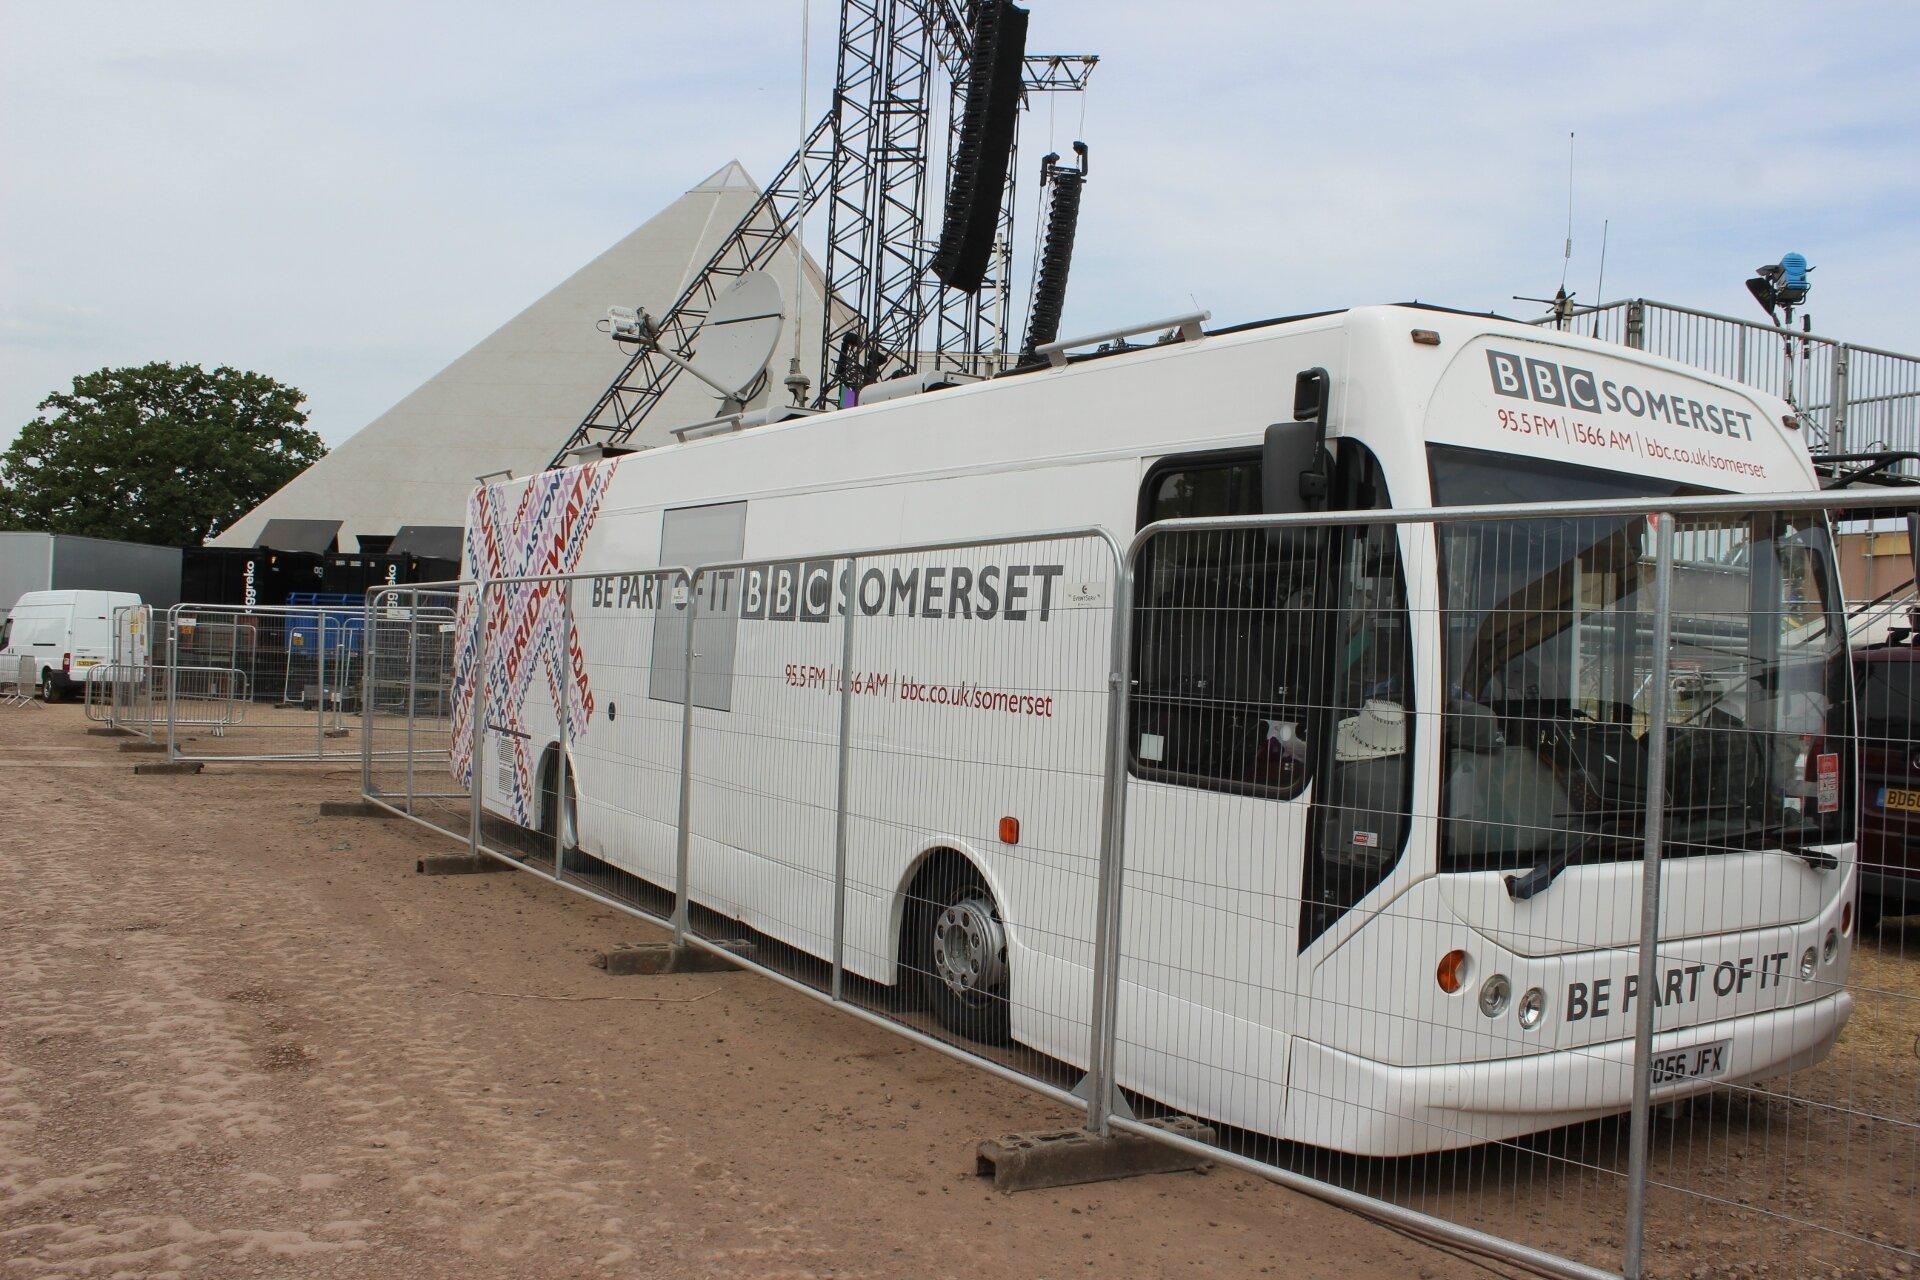 Glastonbury festival 2017 : la couverture médiatique de la BBC : TV radio internet